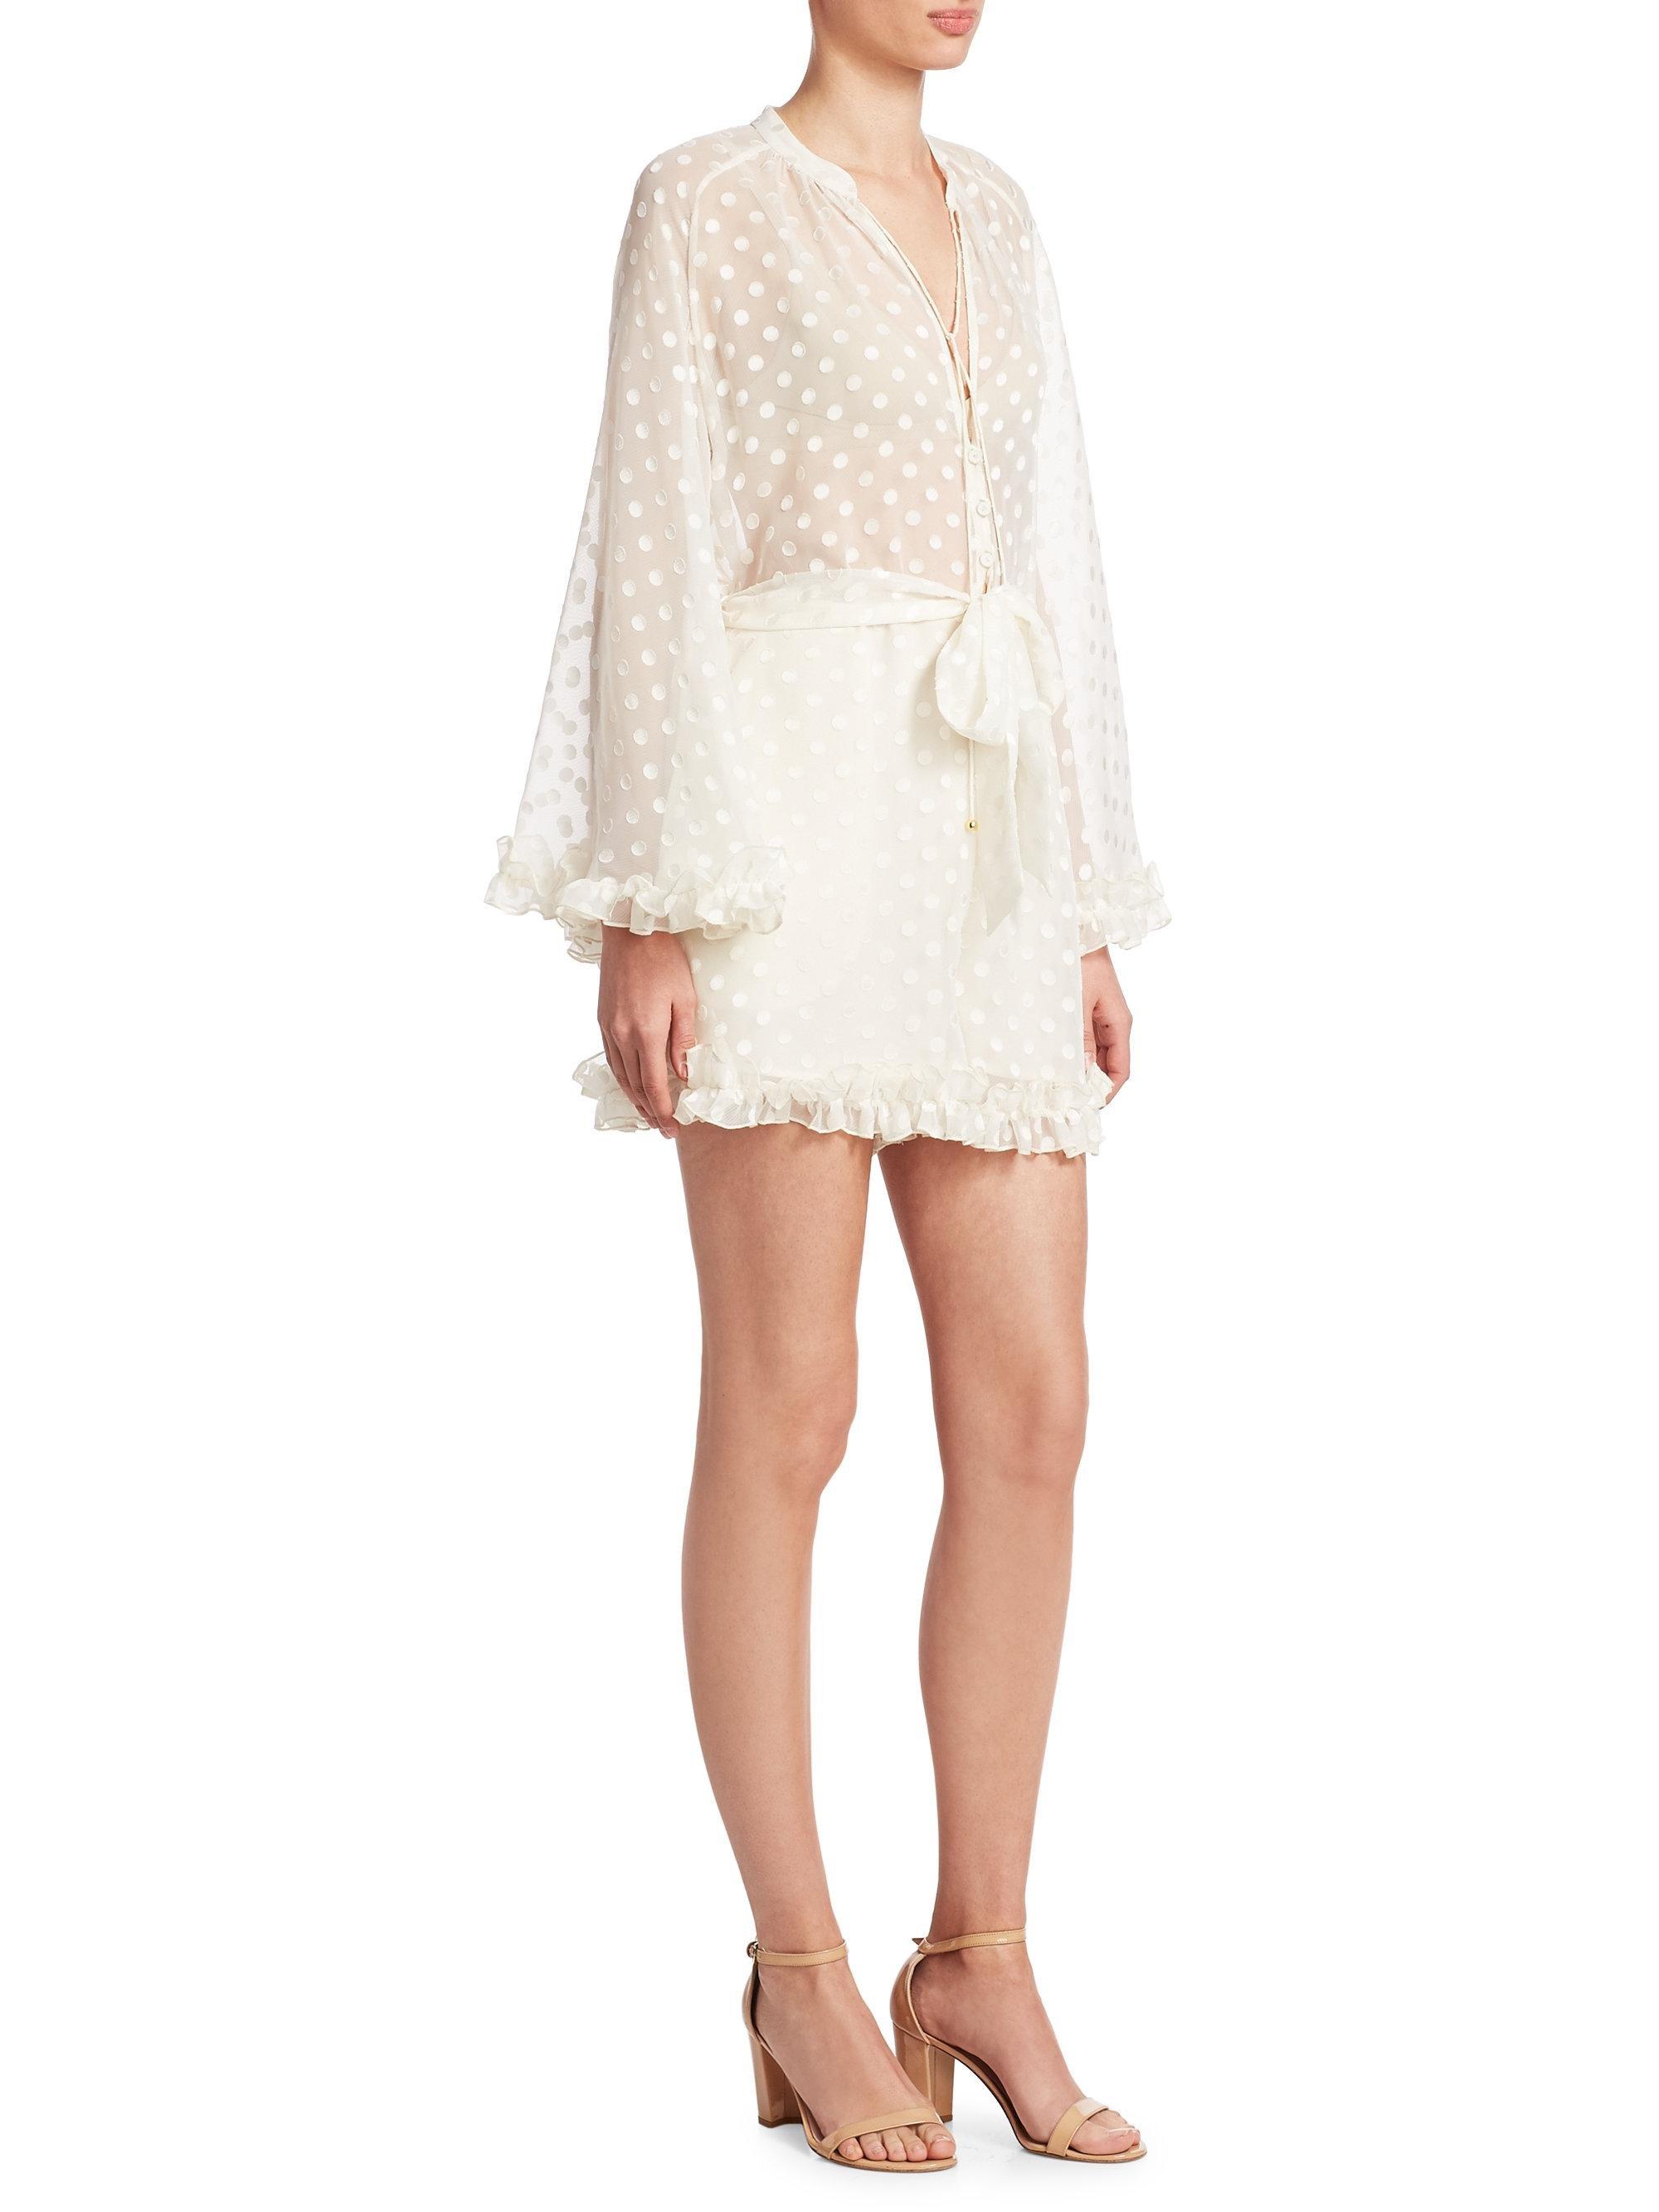 ac91c8420c Lyst - Zimmermann Golden Crinkle Playsuit in White